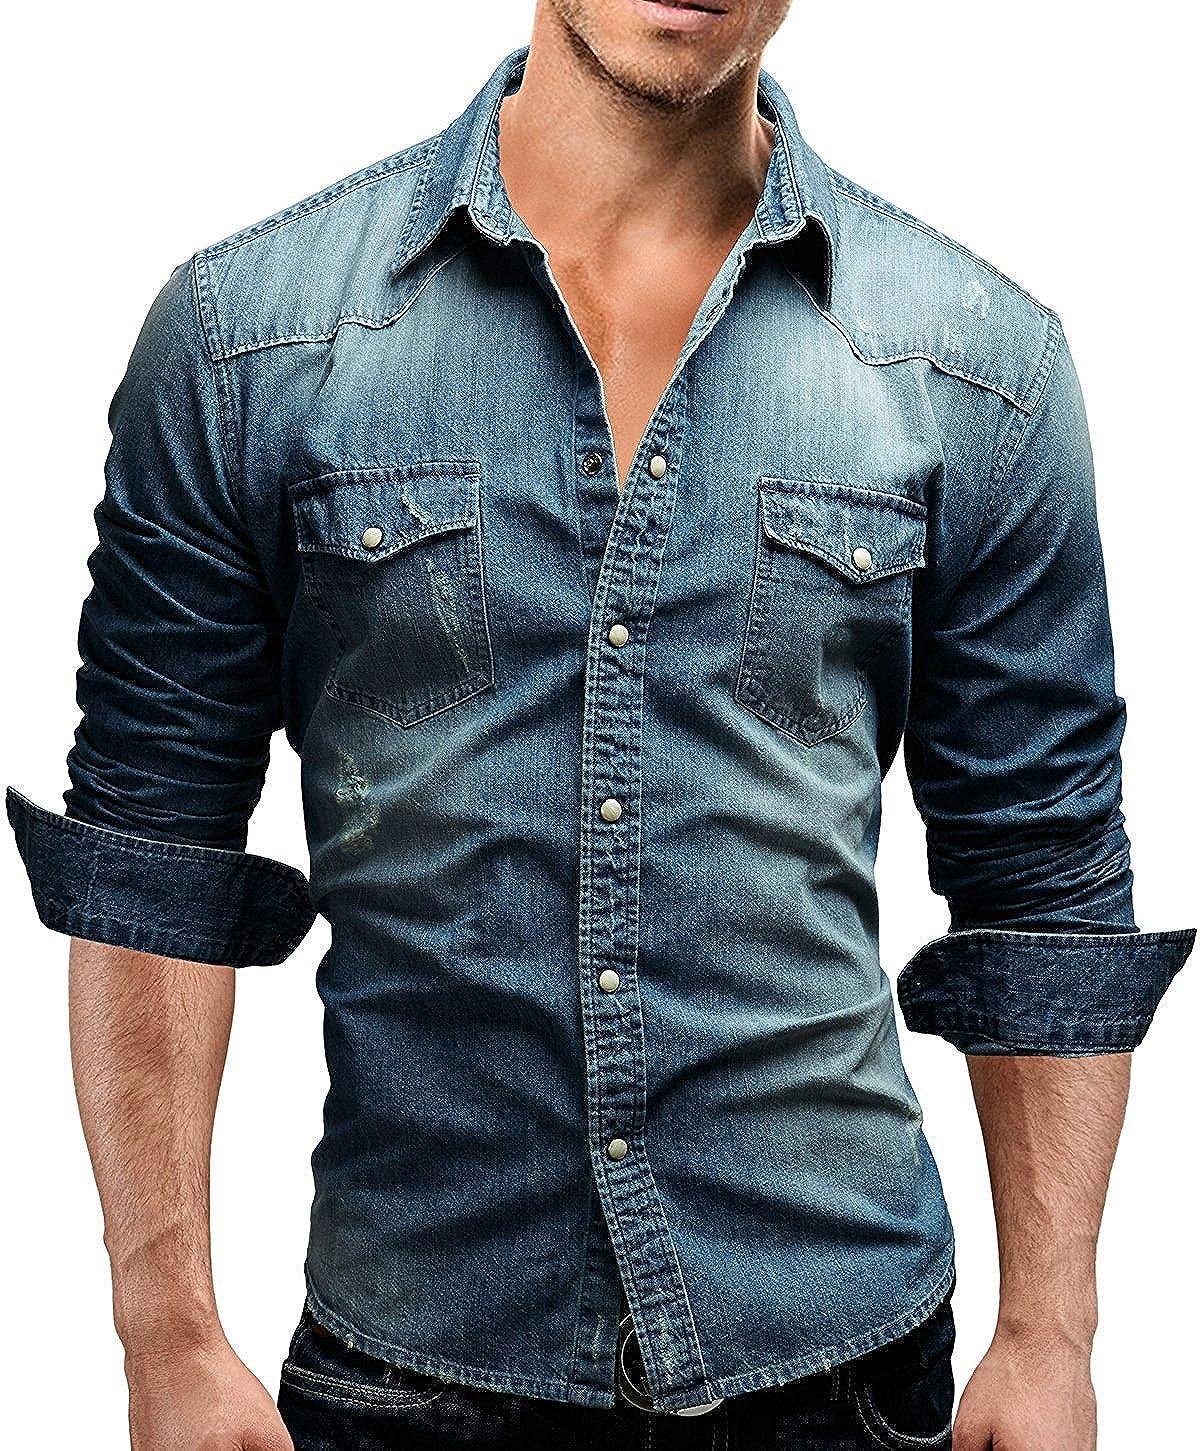 Men's Cotton Cowboy Denim Shirt Snap Button Up Long Sleeve Casual Slim Fit Shirts